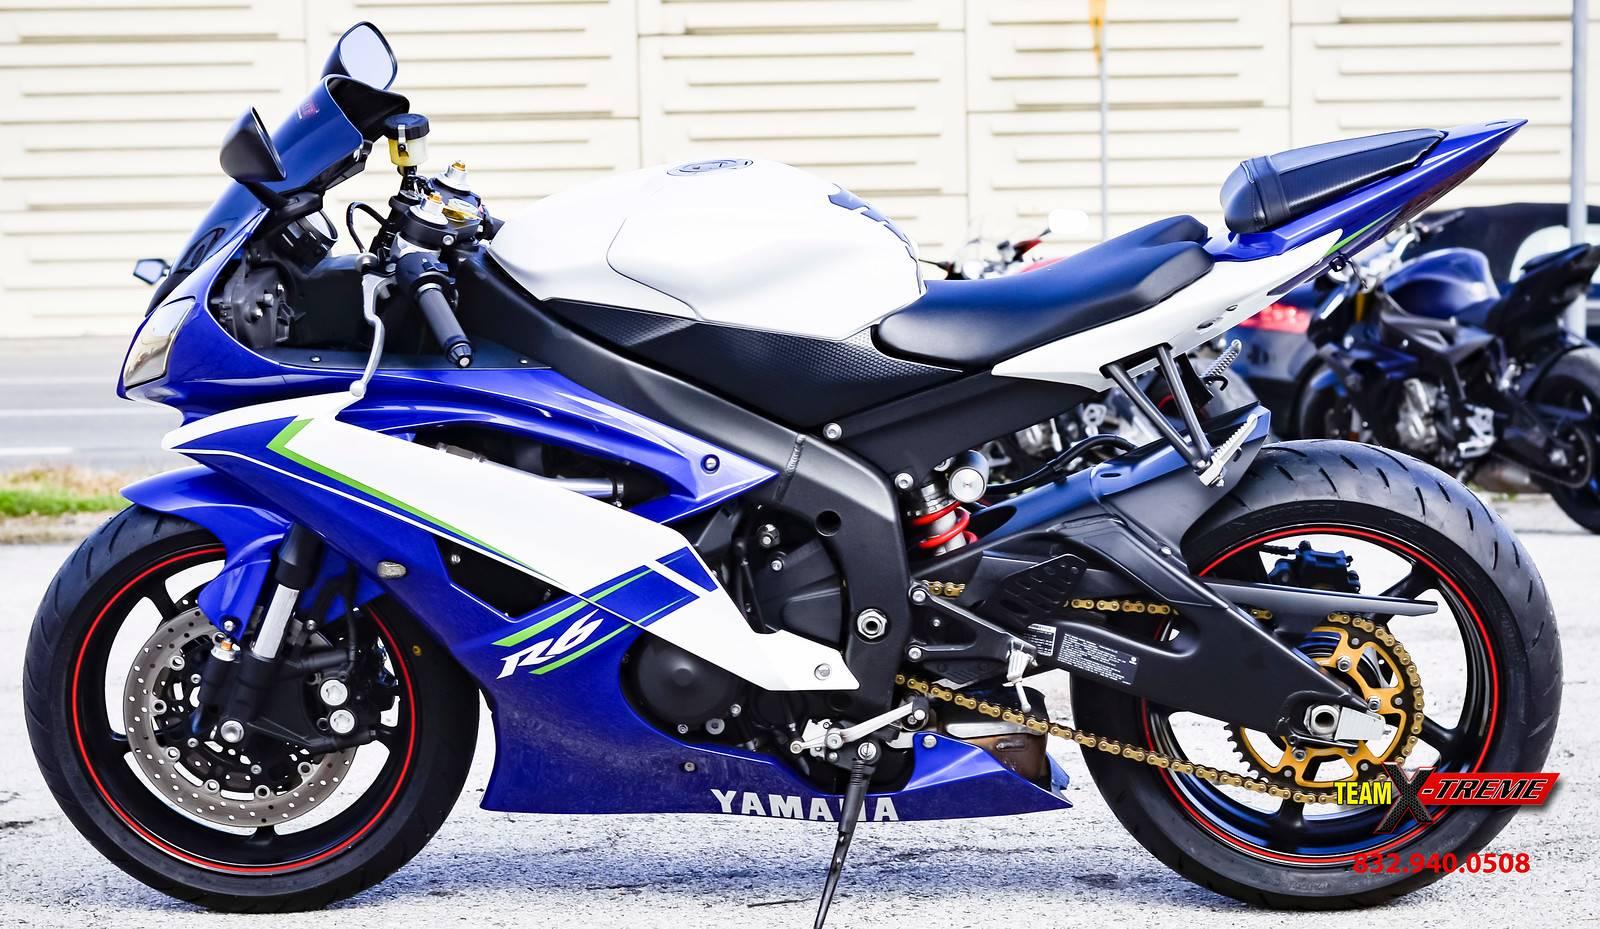 2012 Yamaha YZF-R6 7